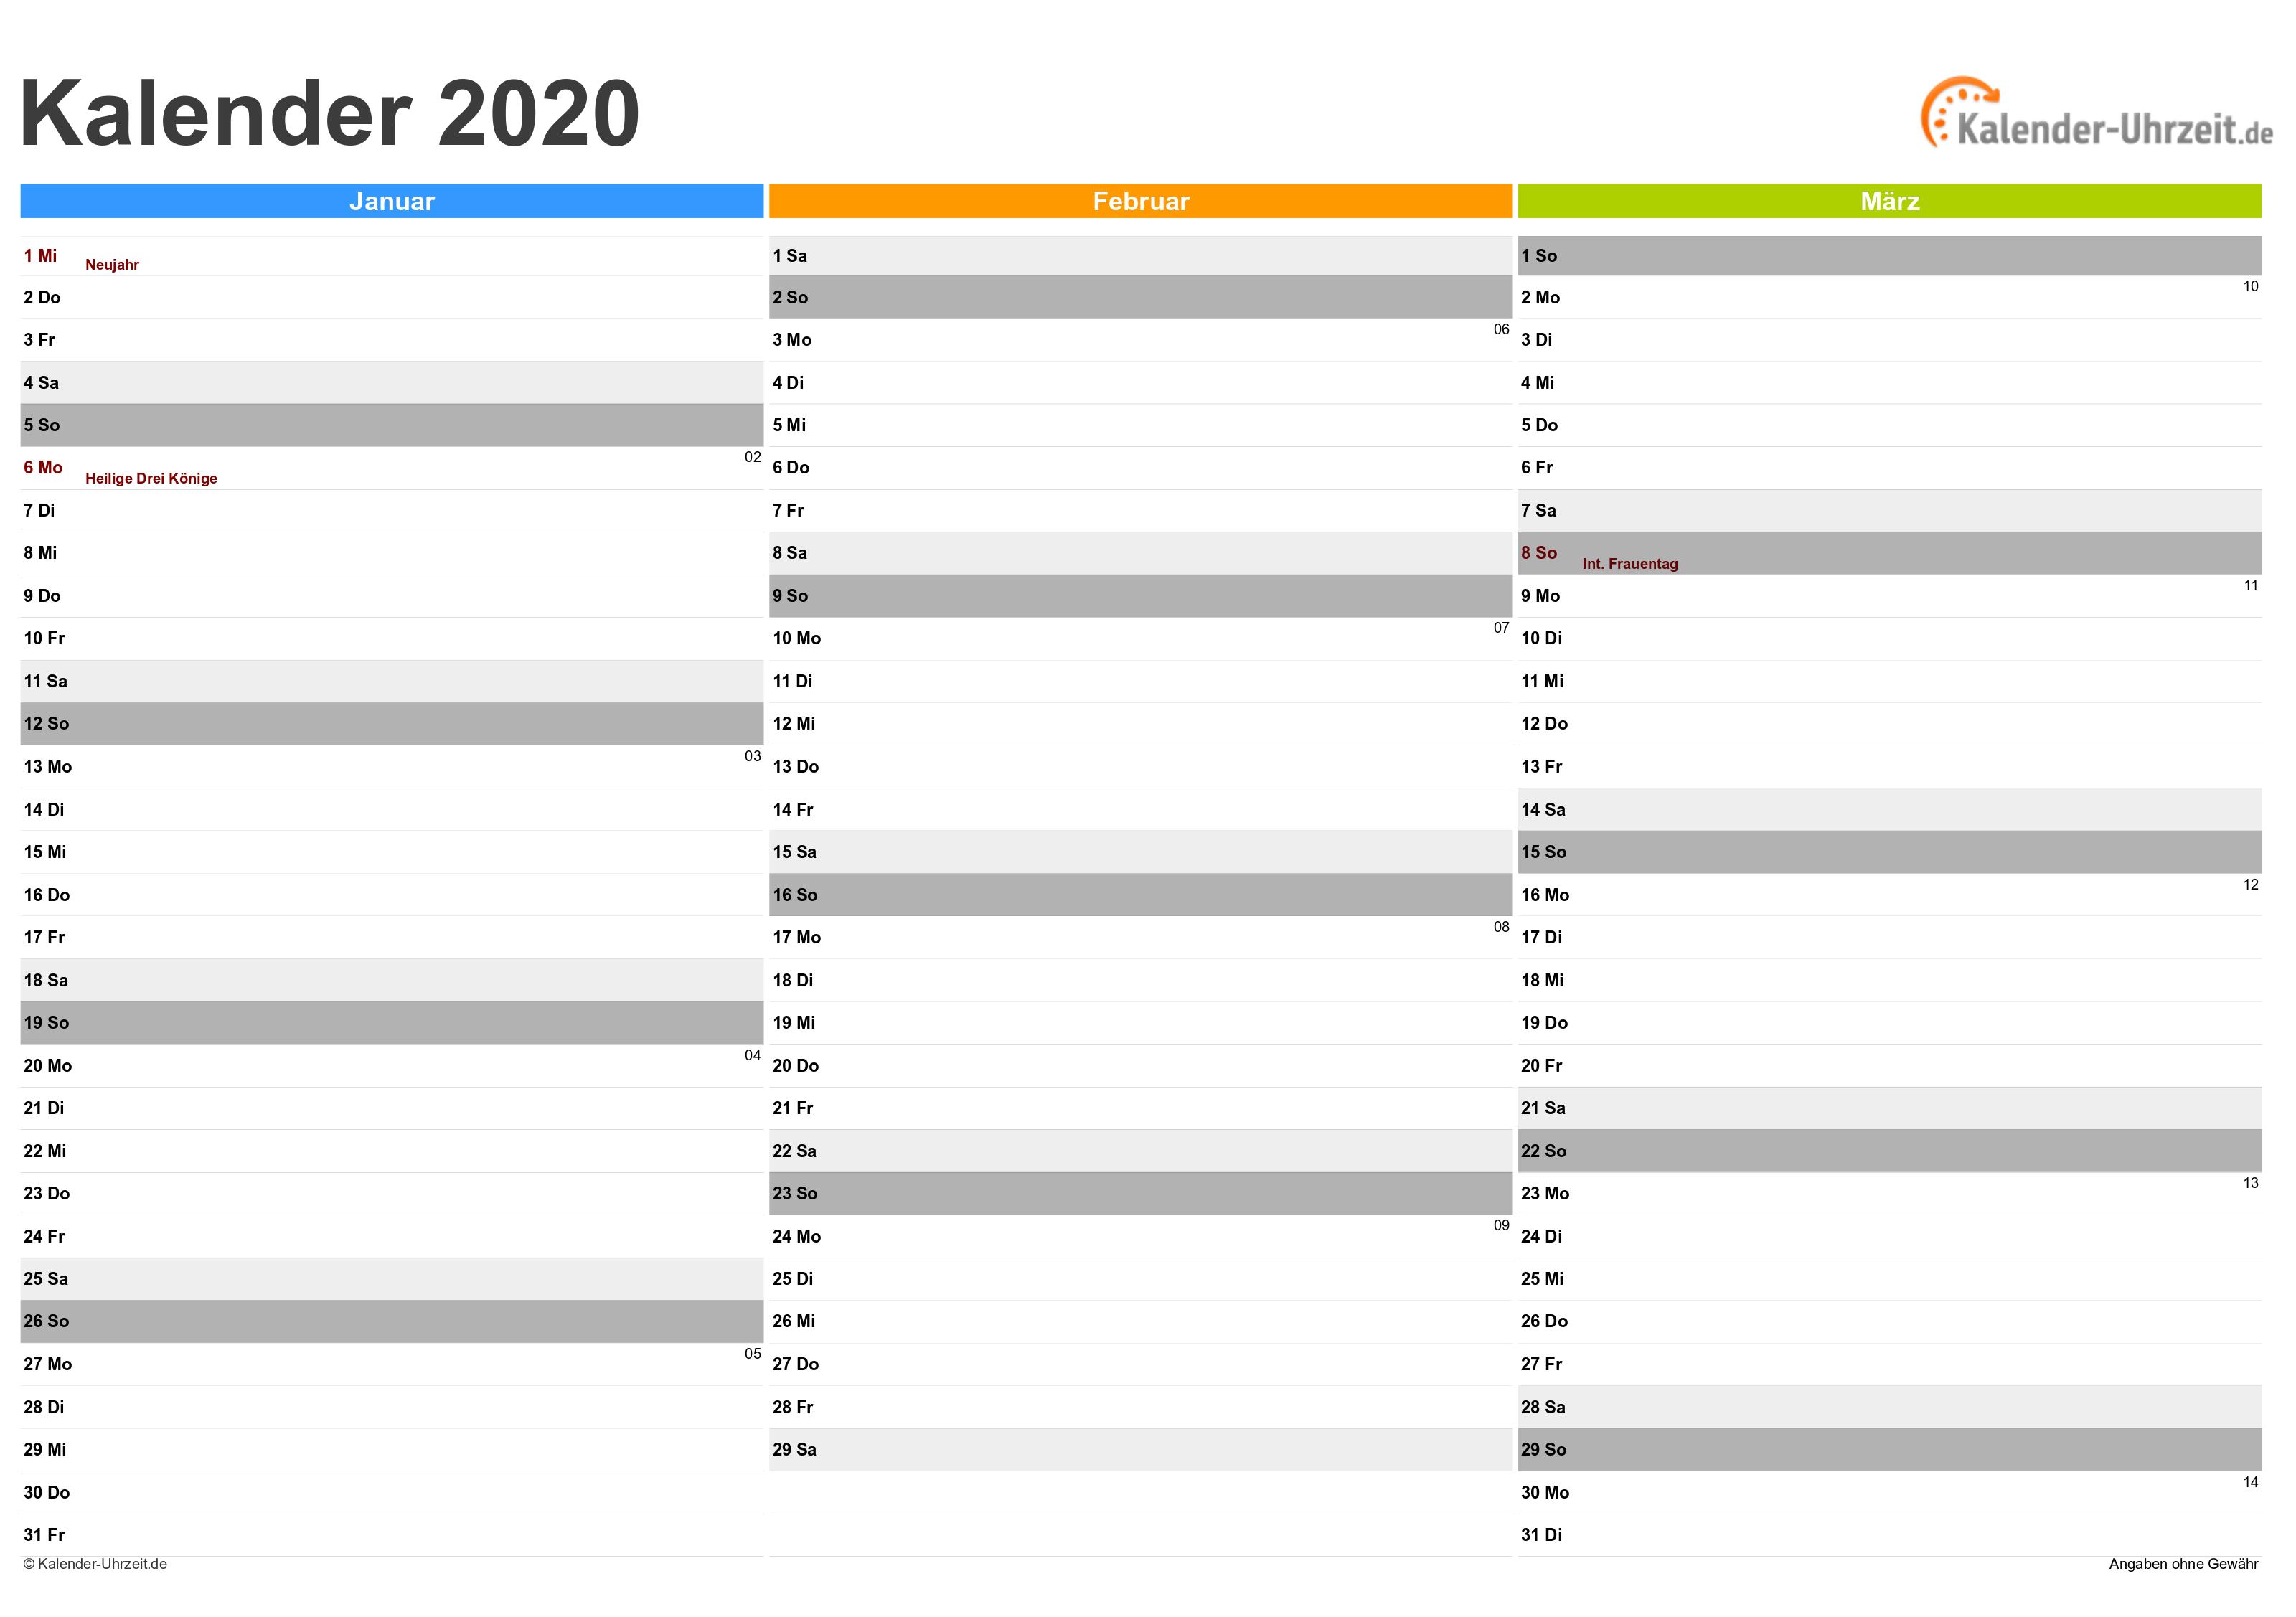 EXCEL-KALENDER 2020 - KOSTENLOS